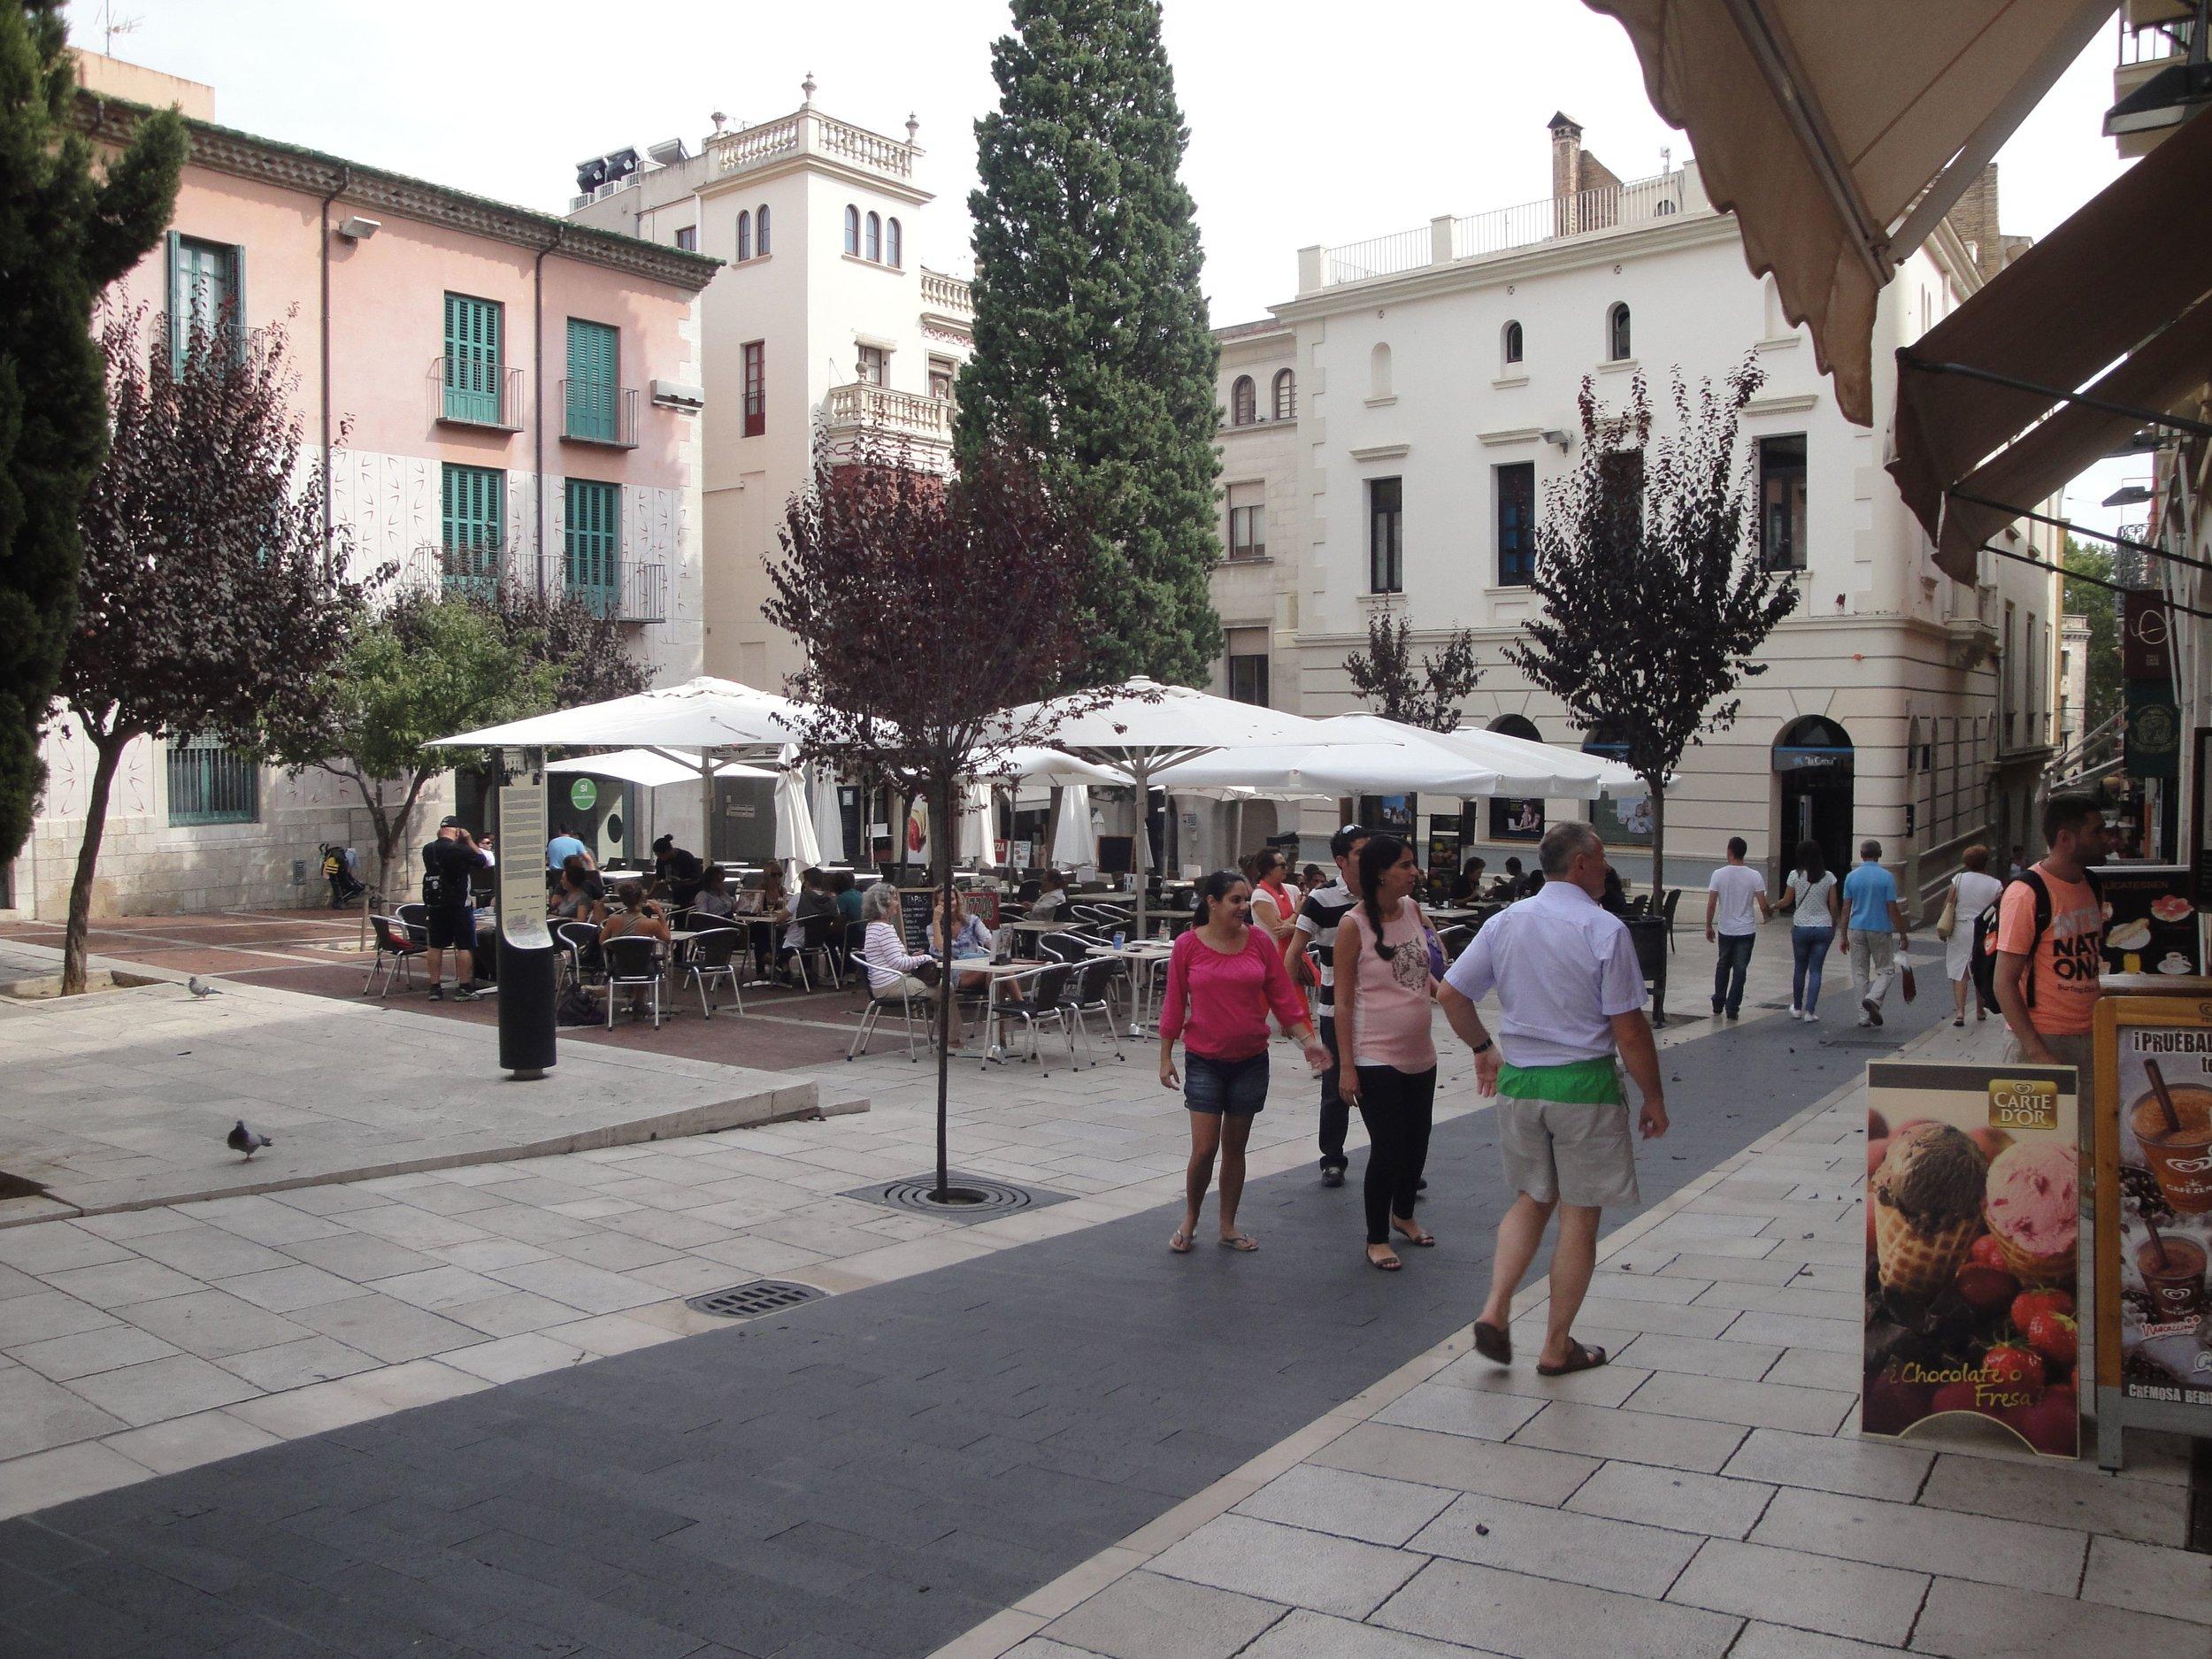 figueres plaza.jpg